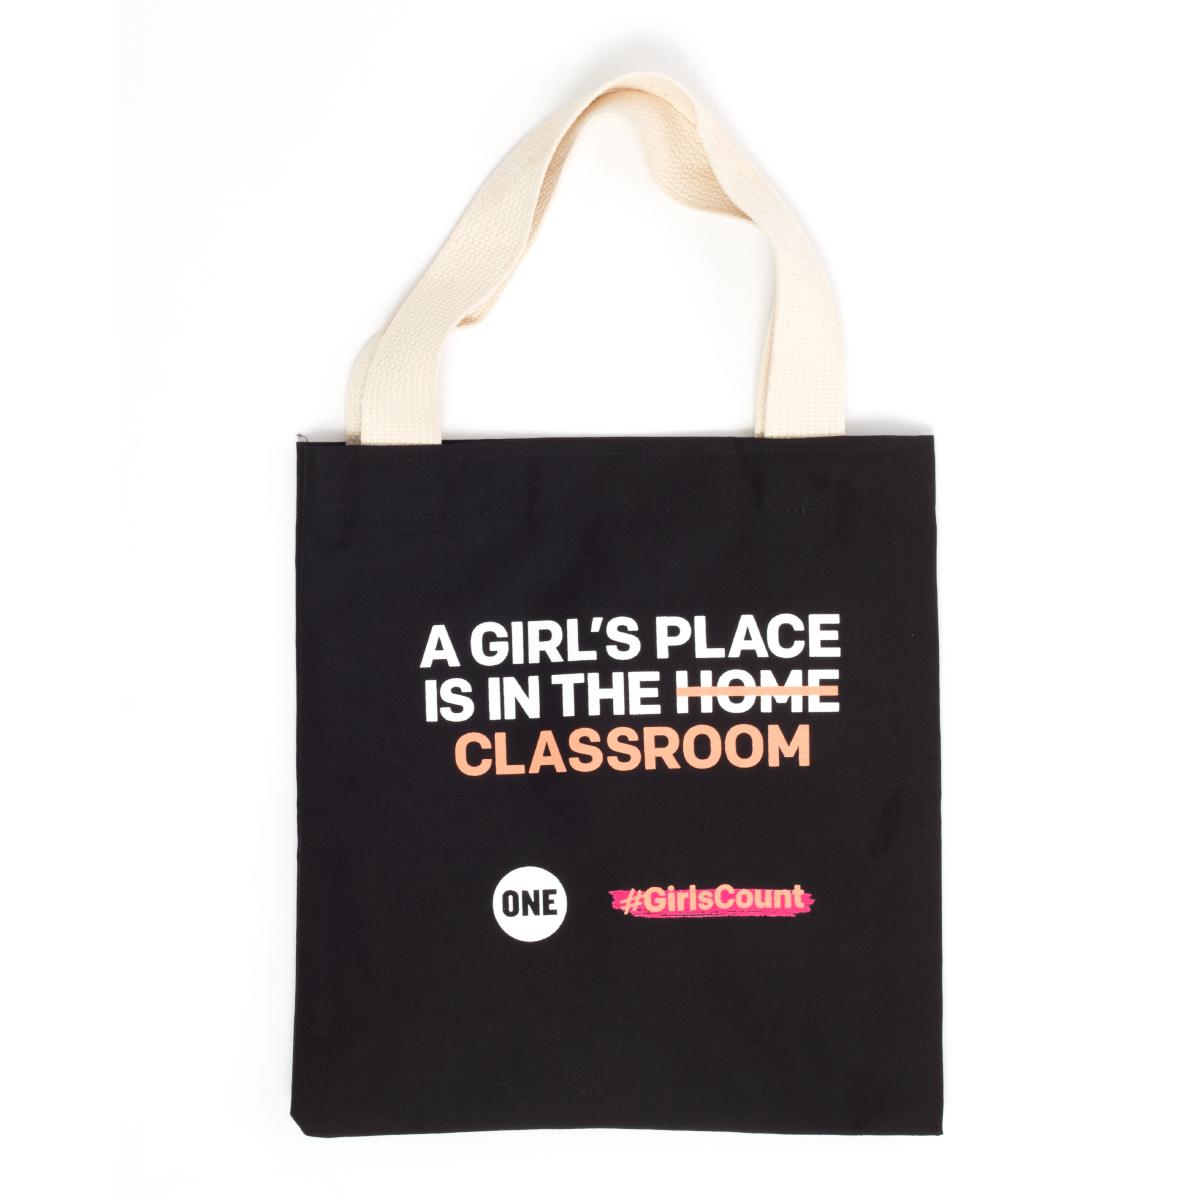 #GirlsCount Tote Bag